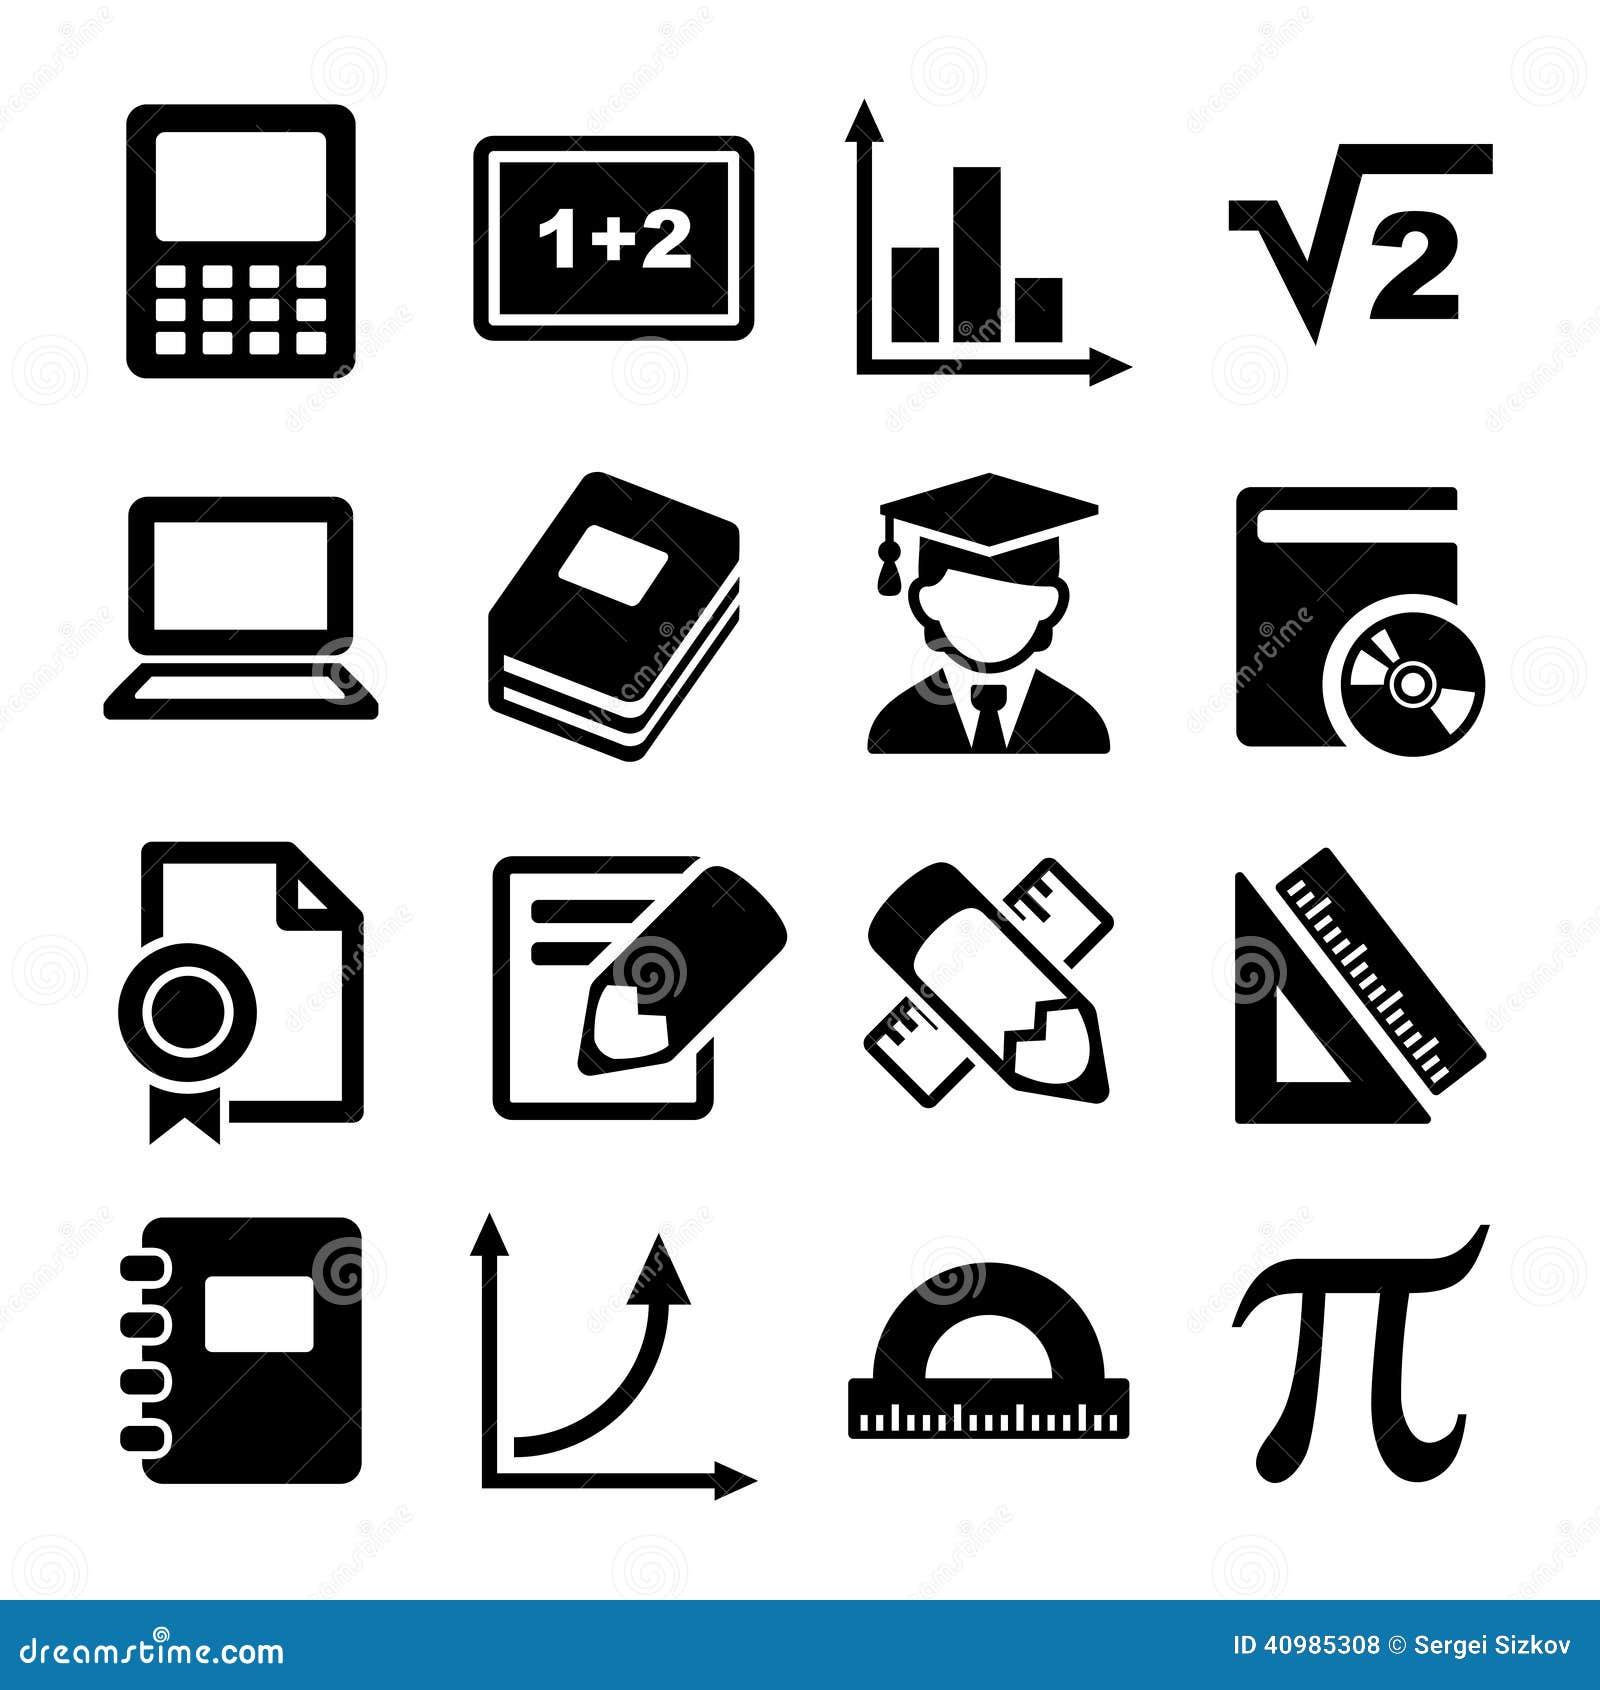 Mathematics vector icons 2 stock image image of calculator 69819341 mathematics icons set royalty free stock photos buycottarizona Image collections